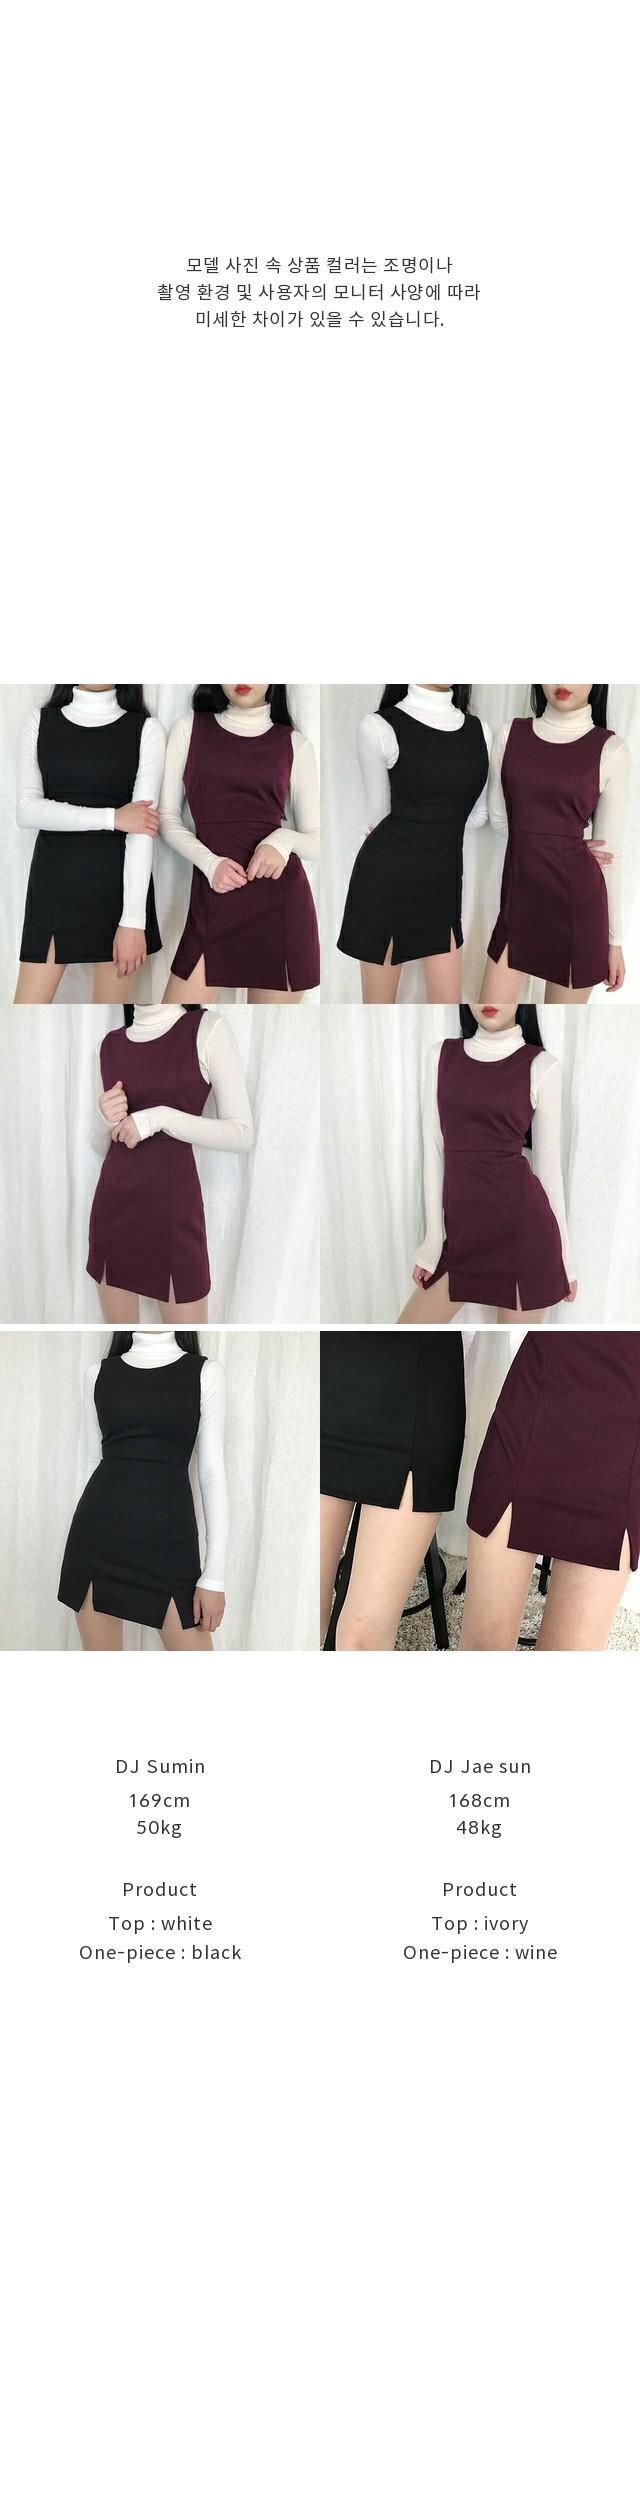 Anatrim Dress